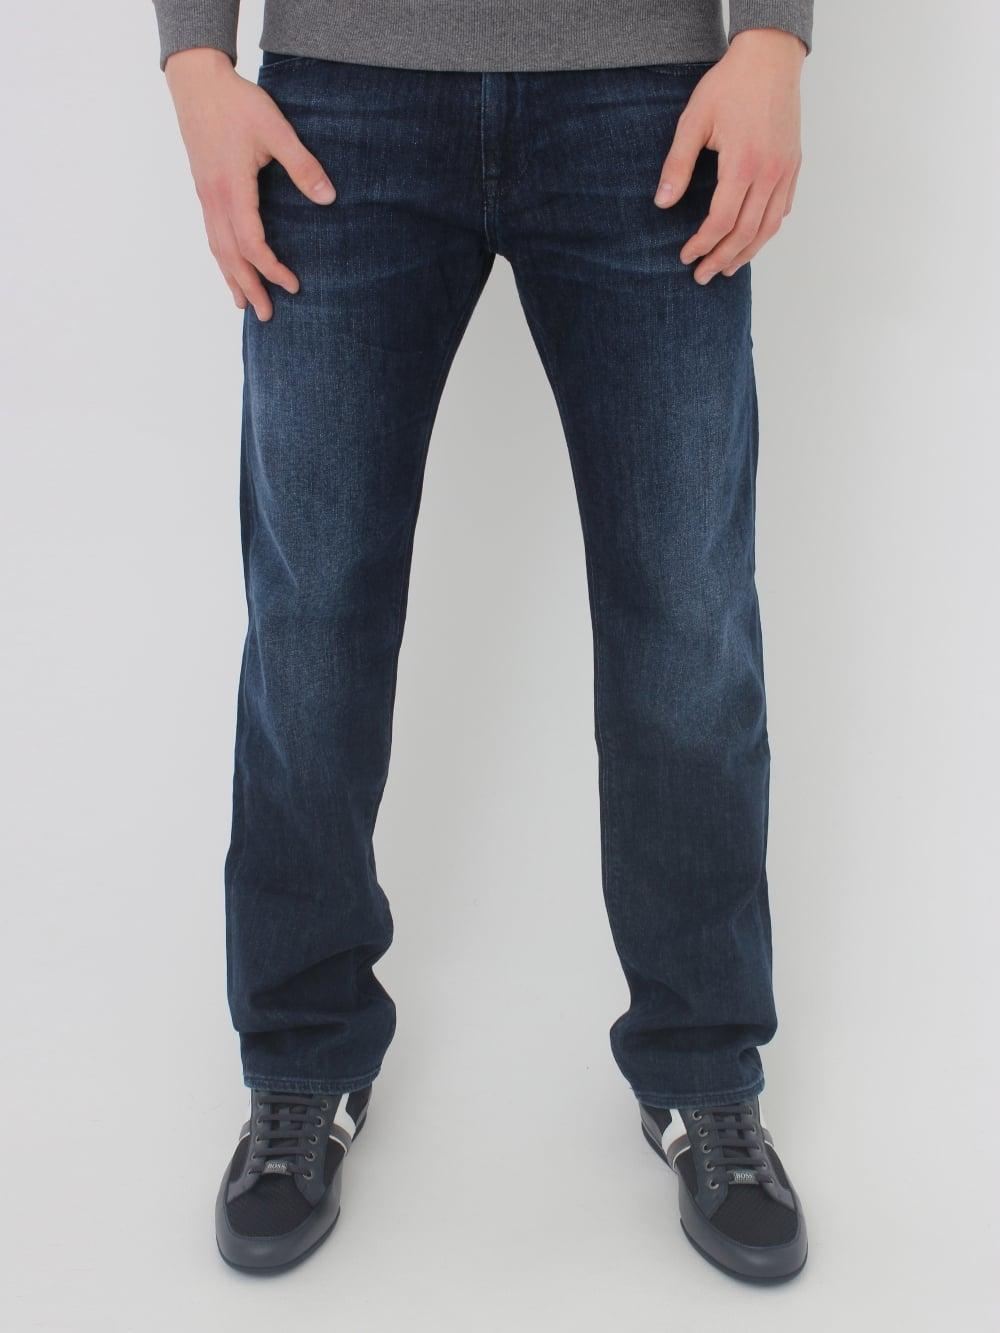 1d669869d543 HUGO BOSS - BOSS Green C-Maine 1 Regular Fit Jeans in Dark Denim ...